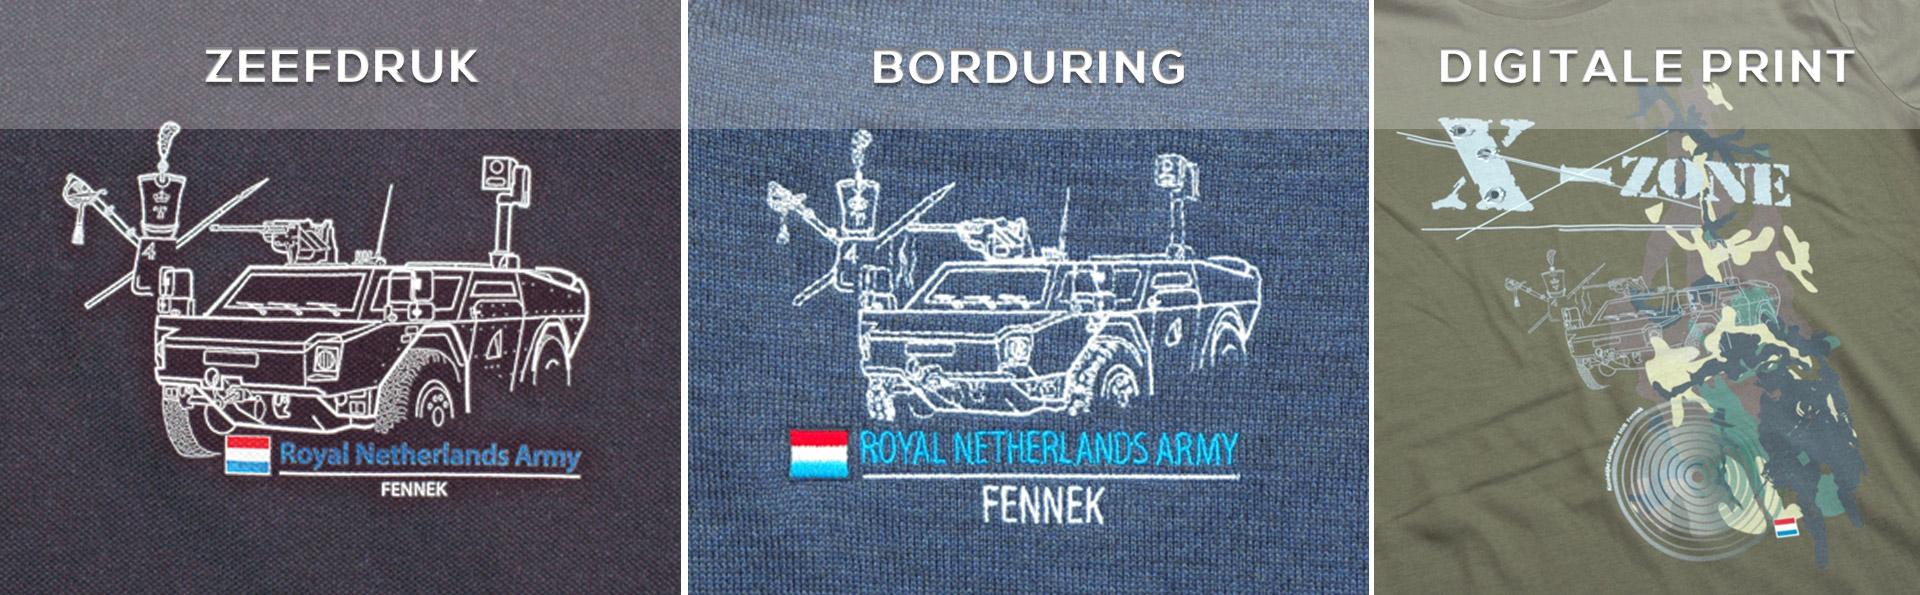 borduring, print en zeefdruk armyprom